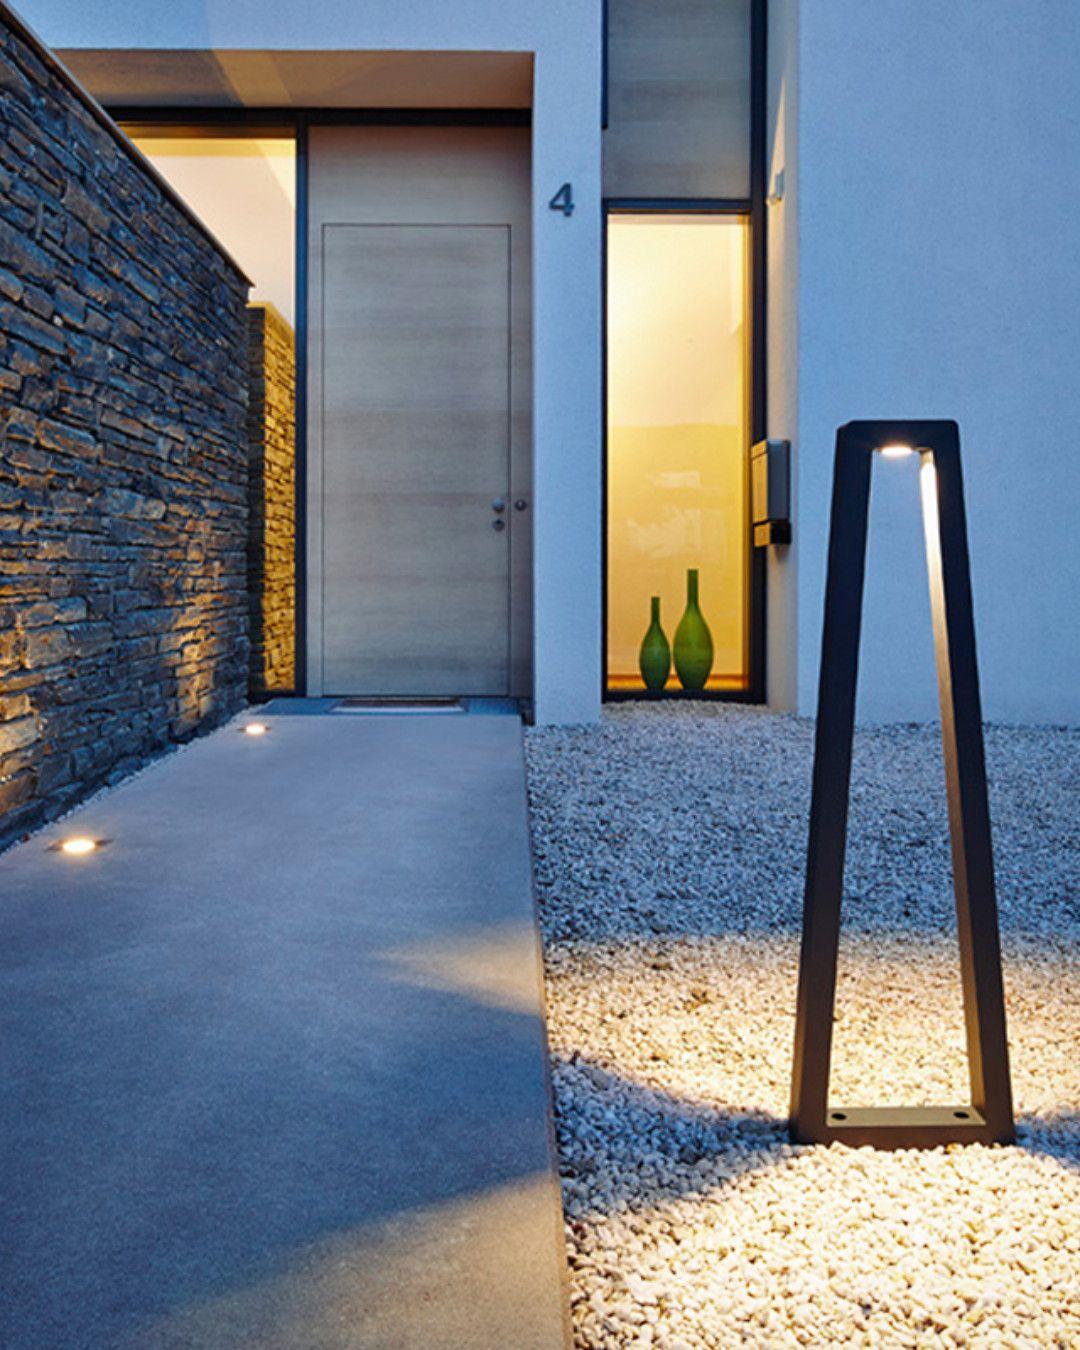 Slv Bookat Led Pollerleuchte 231855 Fassadenbeleuchtung Aussenbeleuchtung Haus Beleuchtung Garten